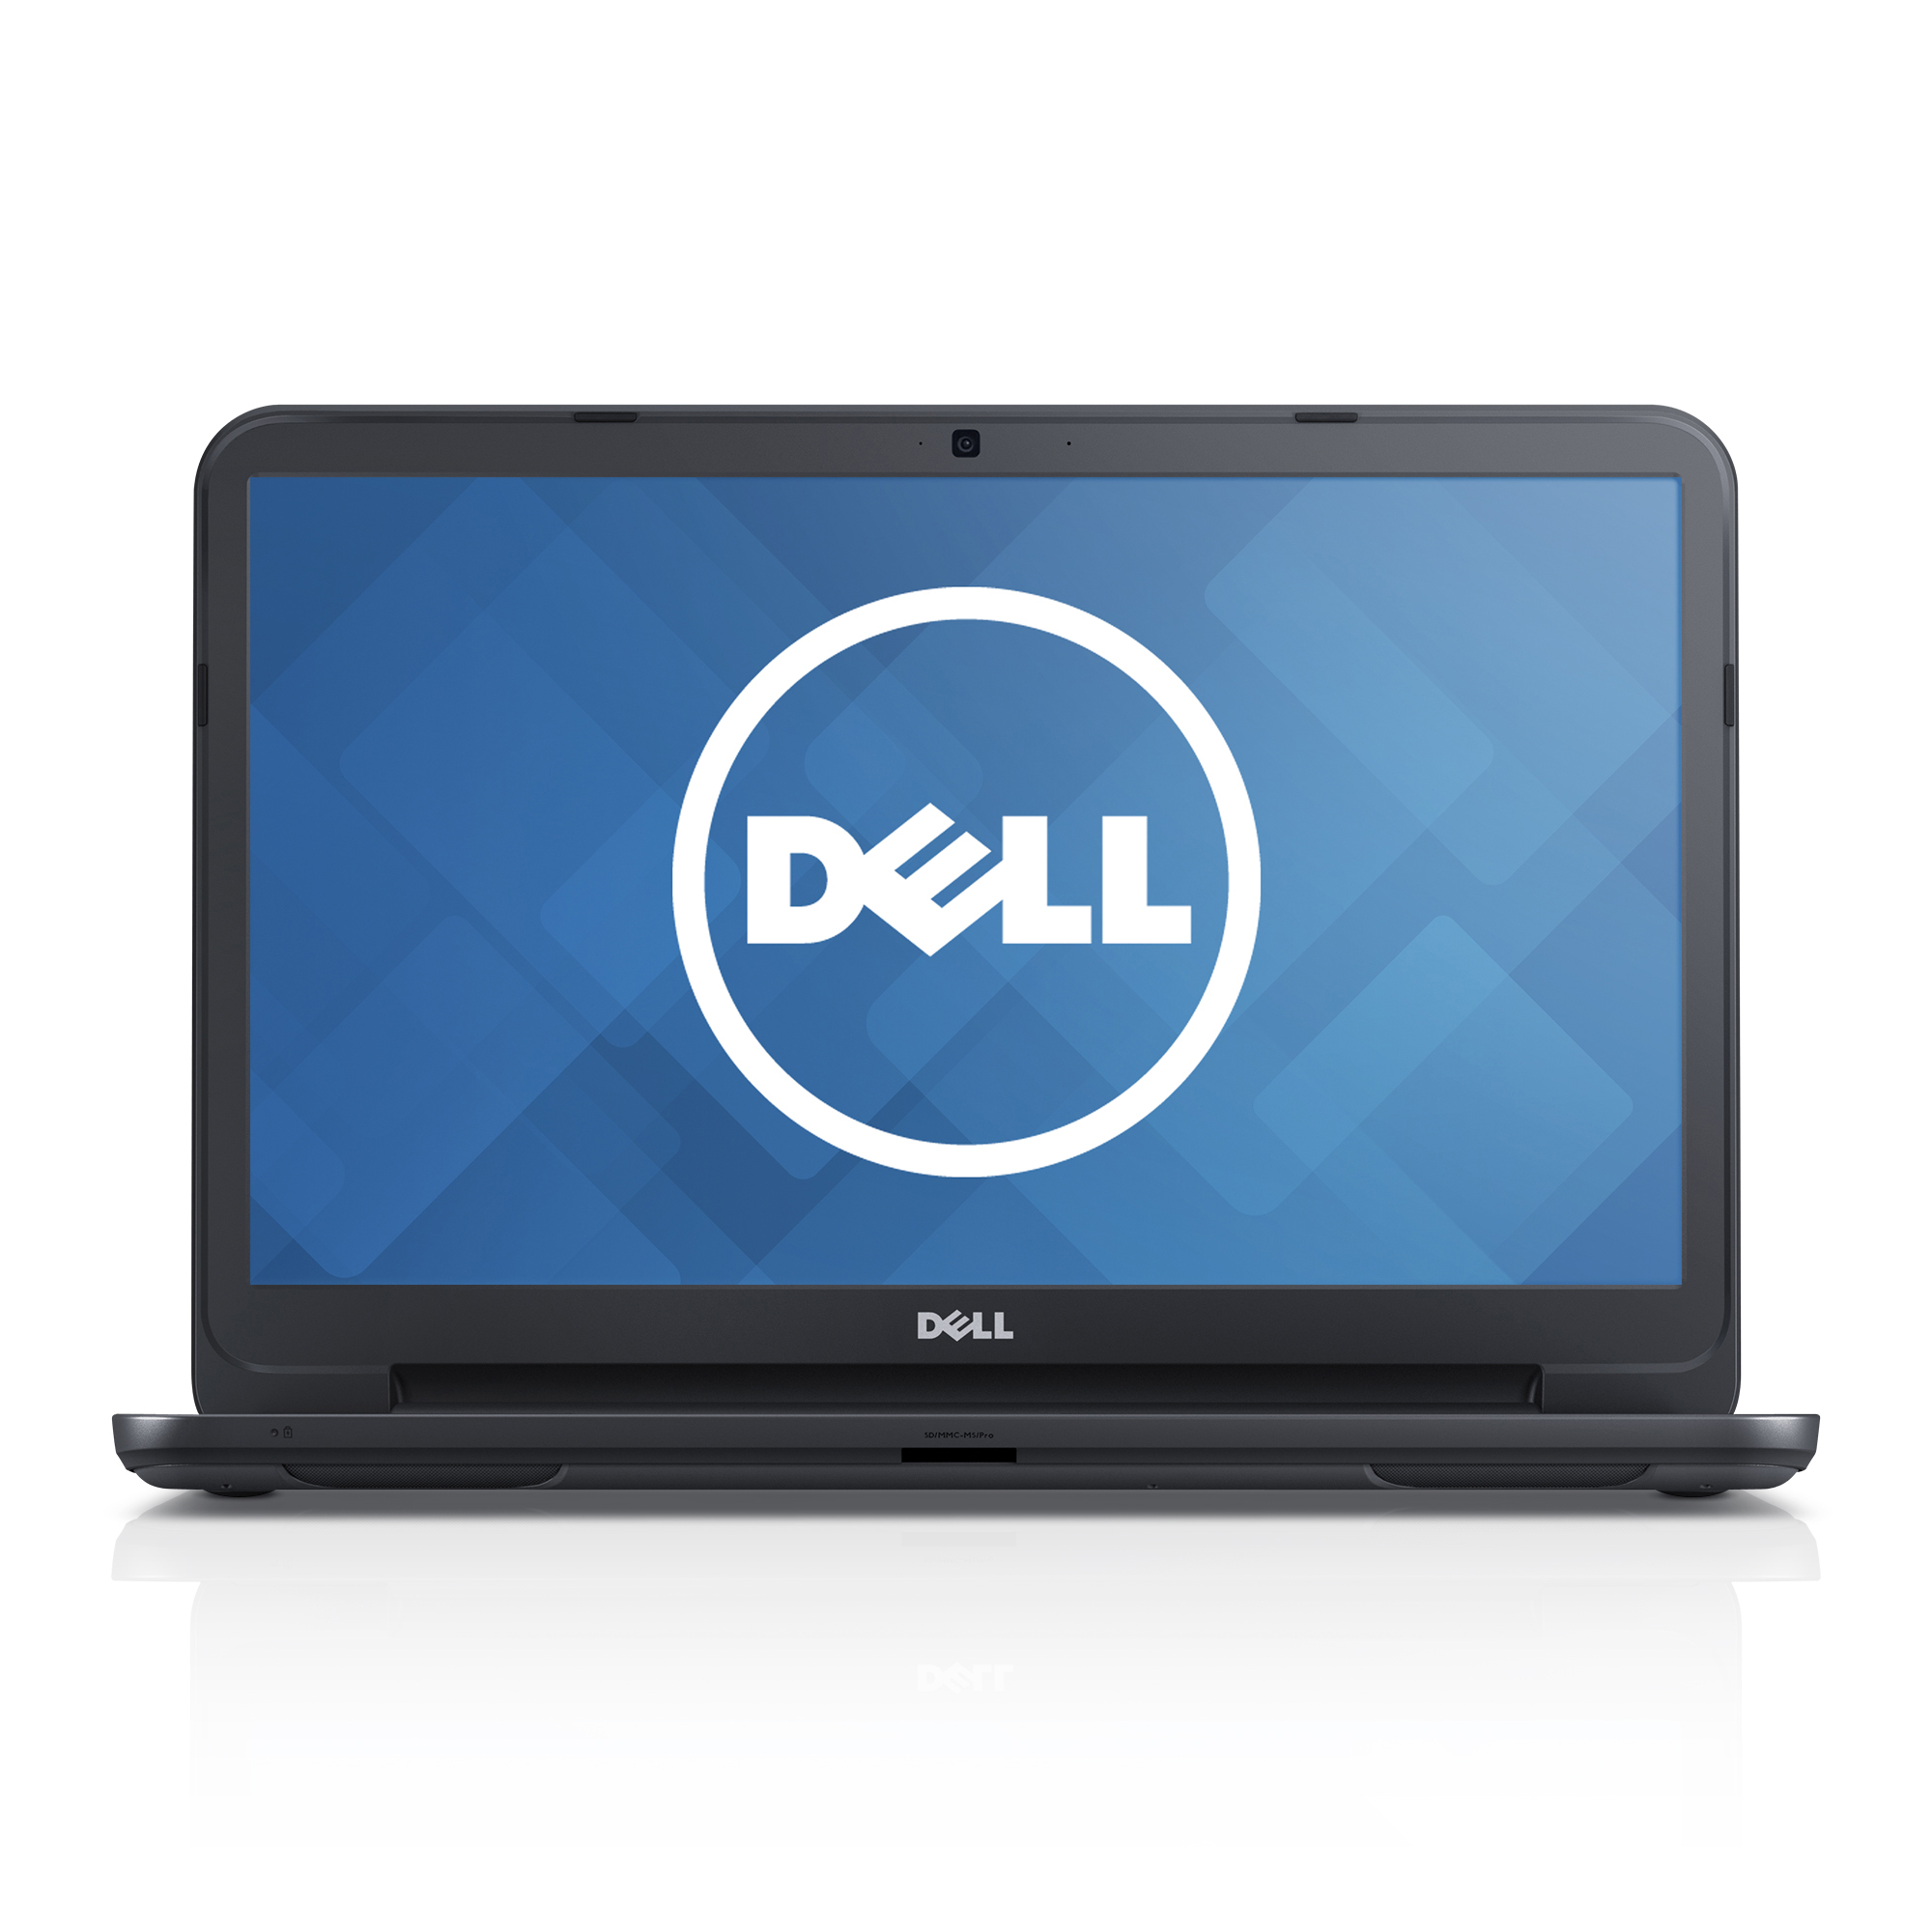 "Dell™ Inspiron 15 Laptop Computer With 15.6"" Screen & Intel® Celeron® Dual-Core Processor, i3531-1200BK"